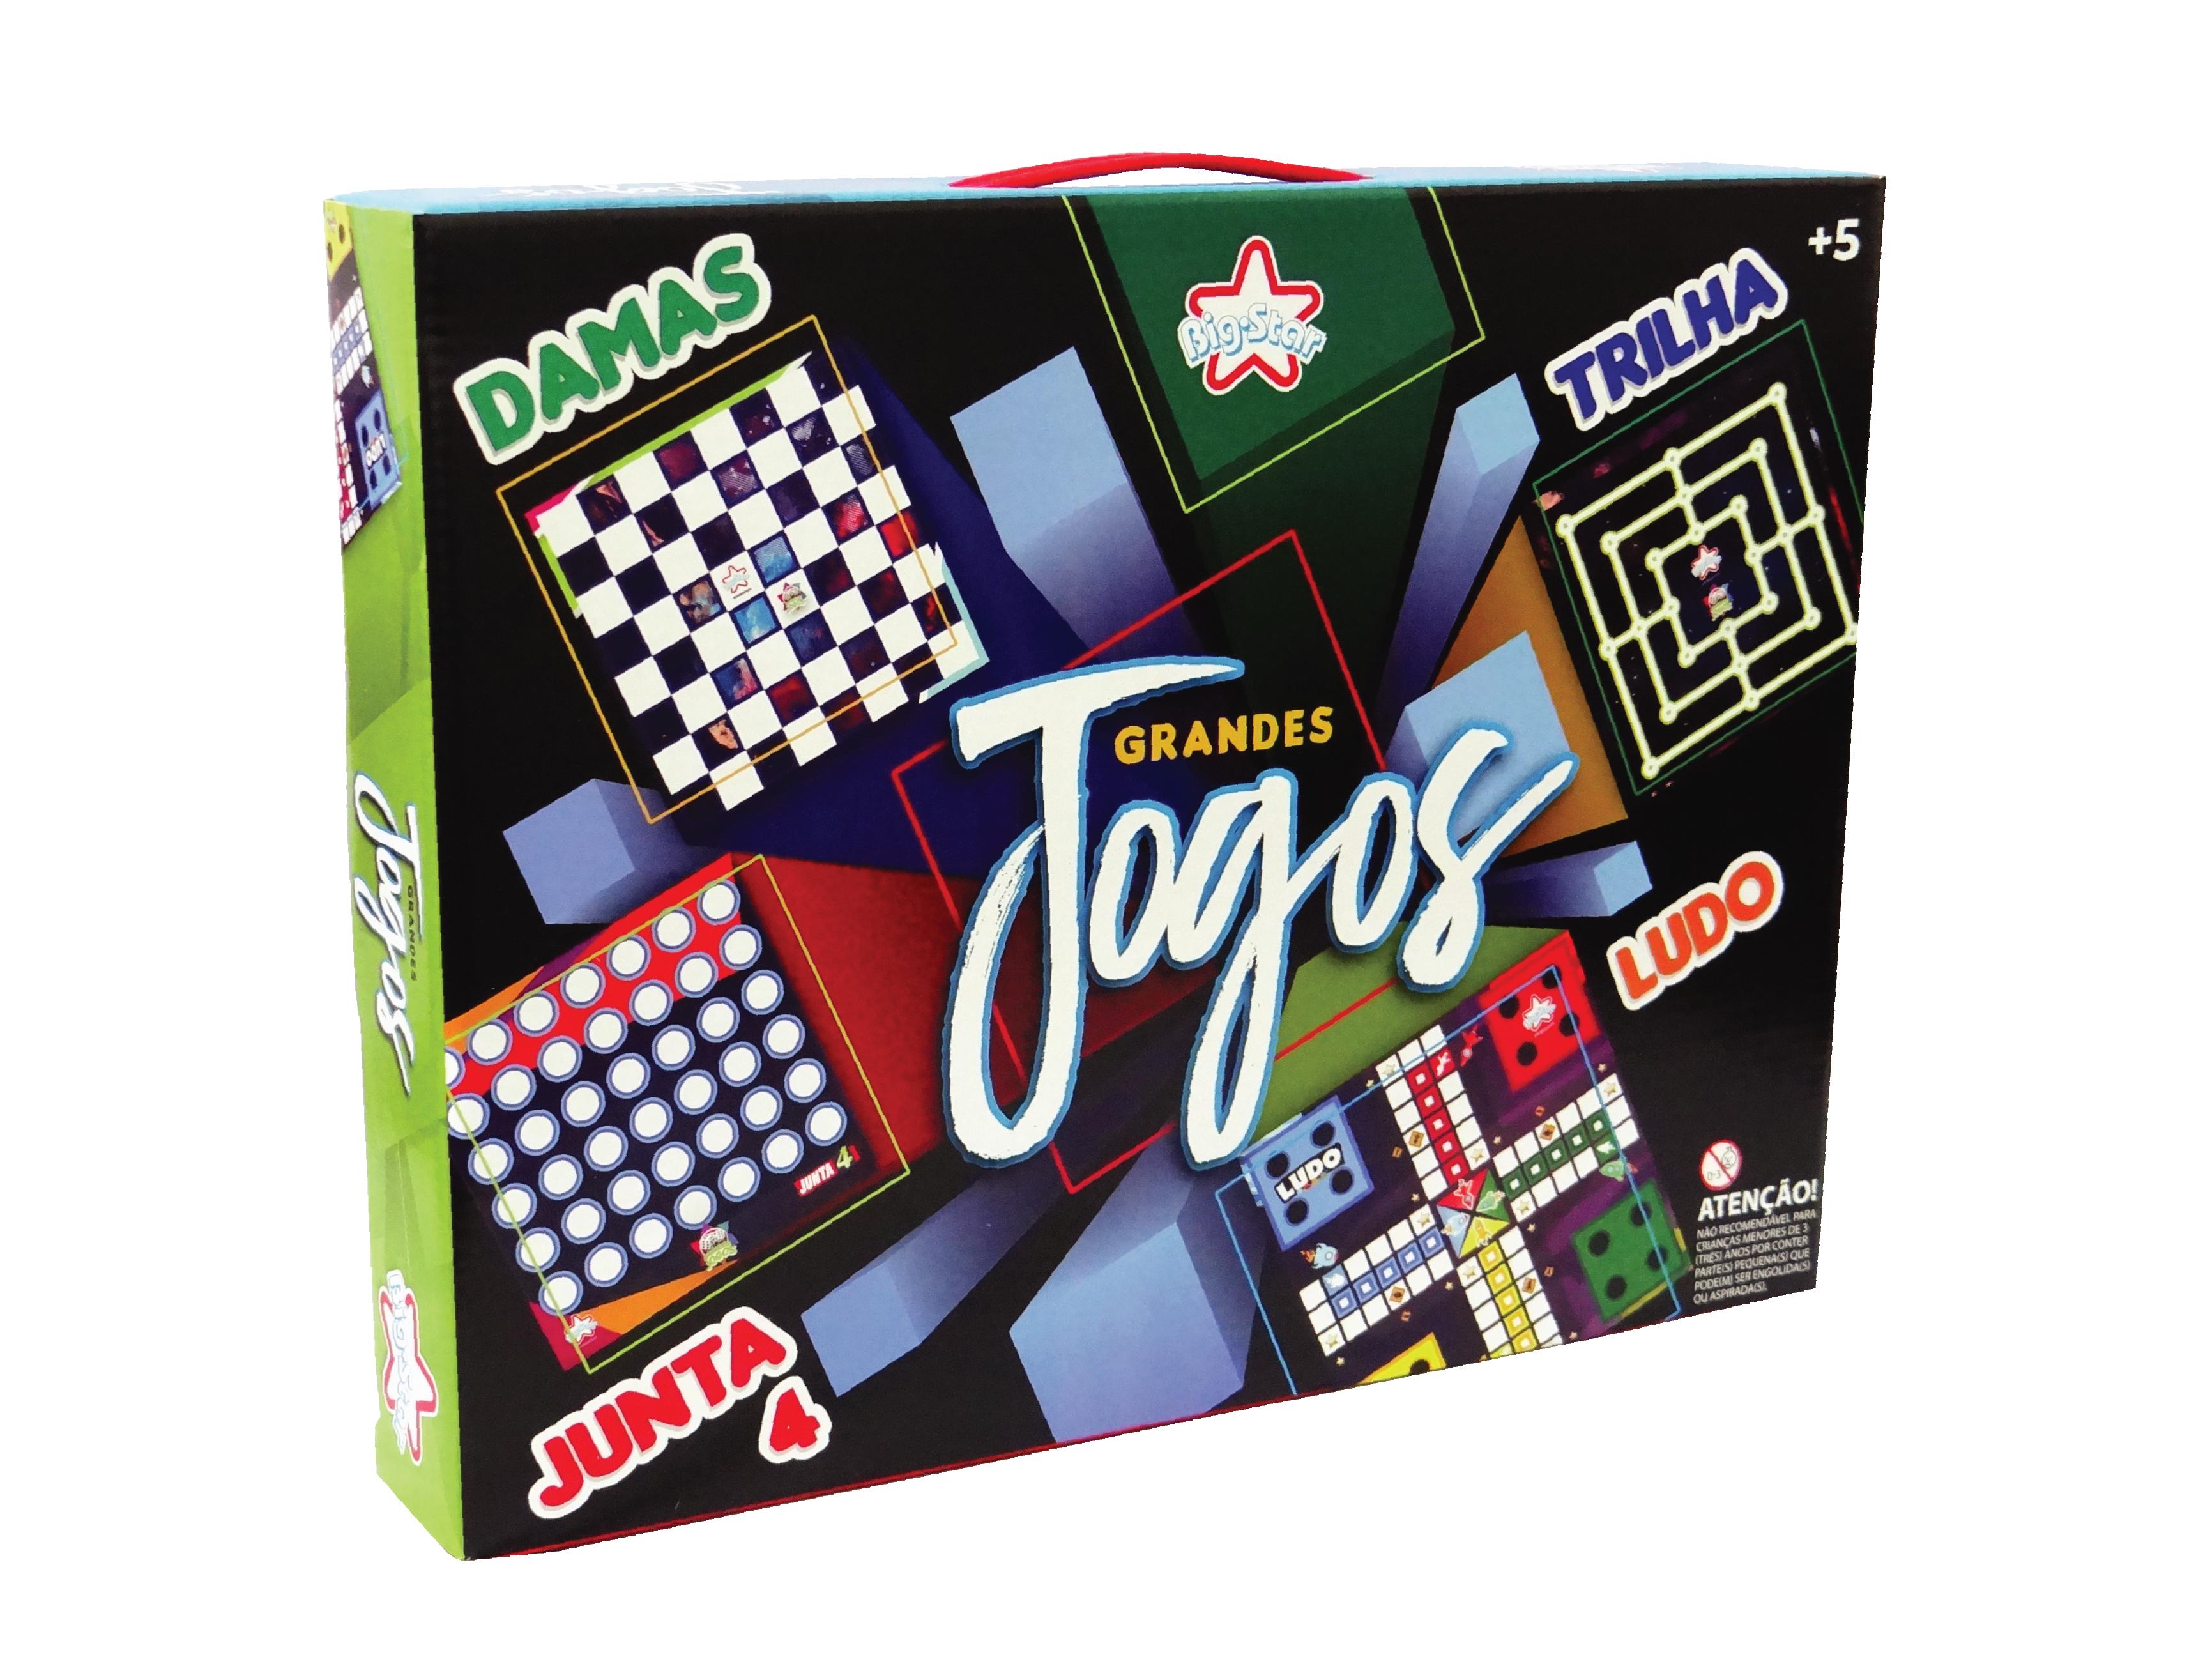 156-GJ - Grandes Jogos